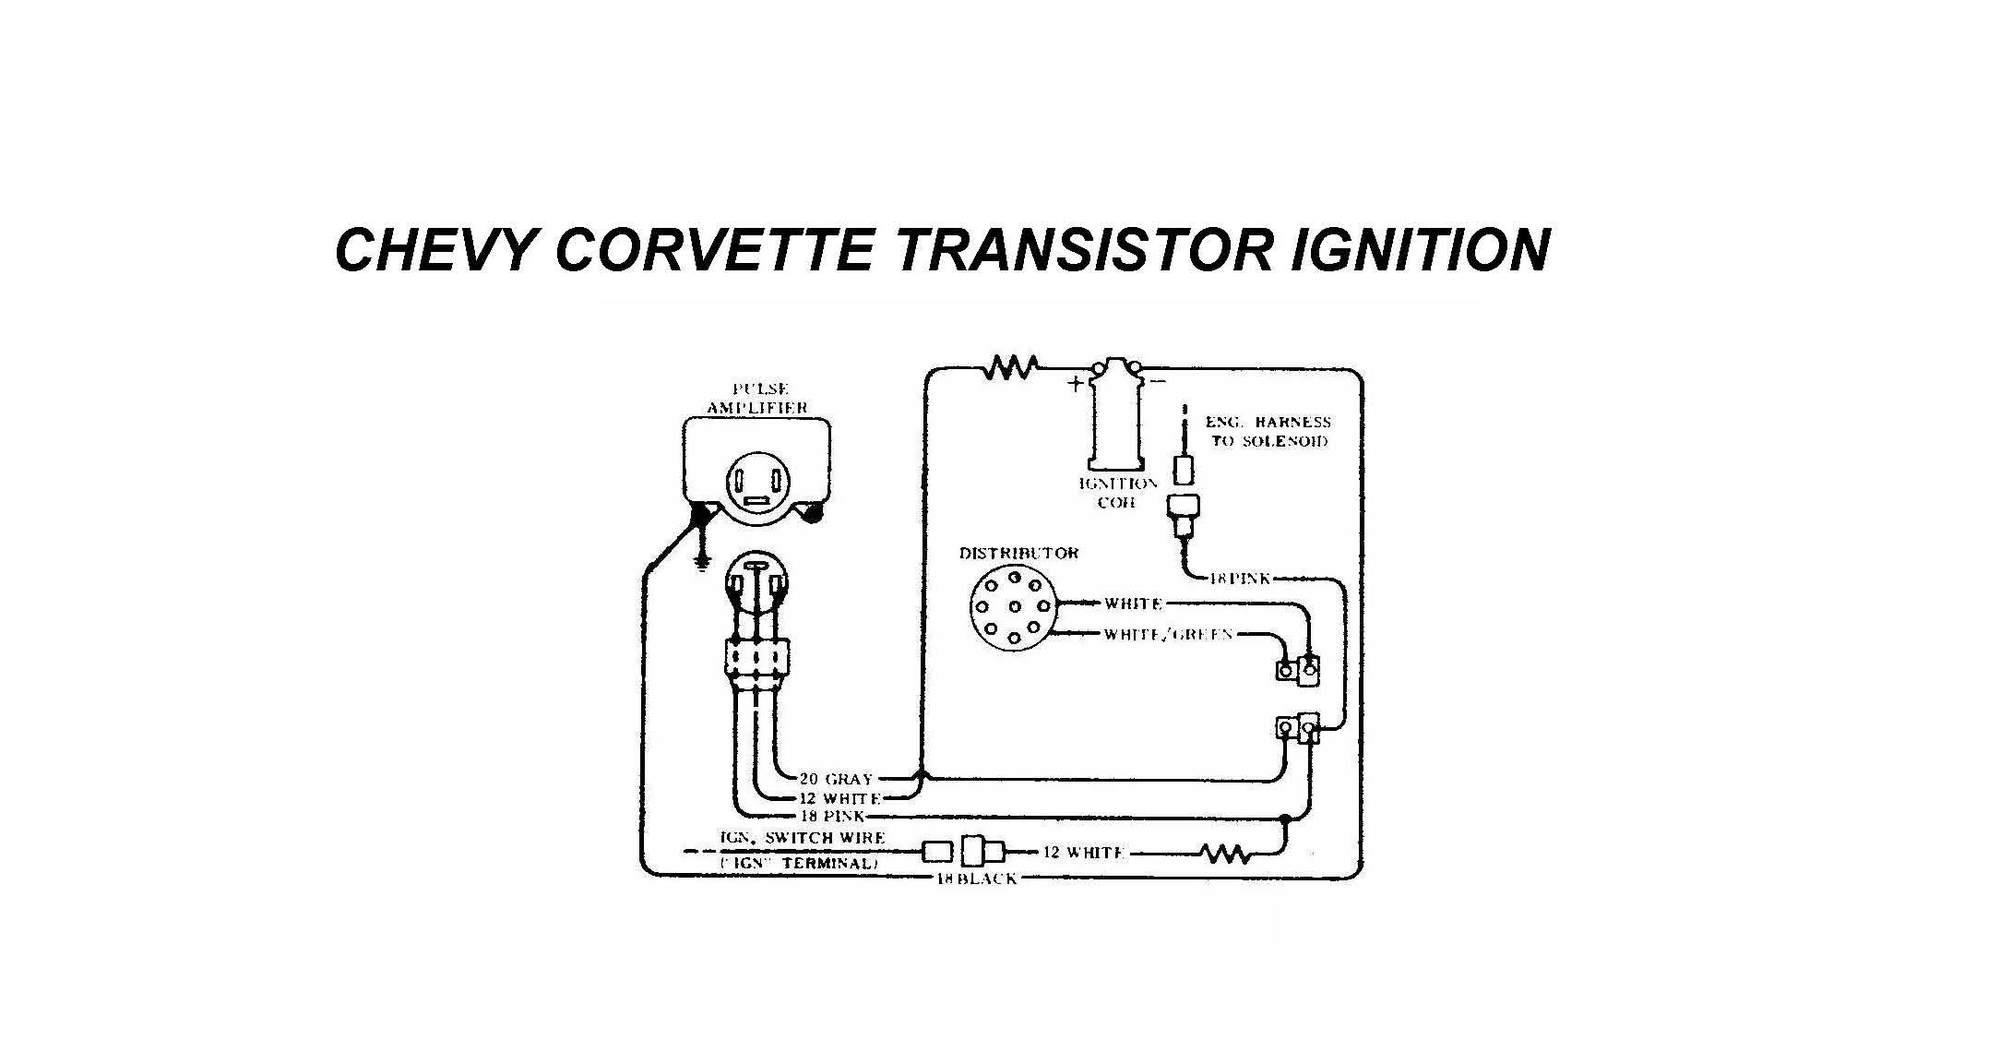 Chevy Corvette Transistor Ignition Switch Wiring Diagram 1969 Help Corvetteforum Chevrolet Rh Com Gm